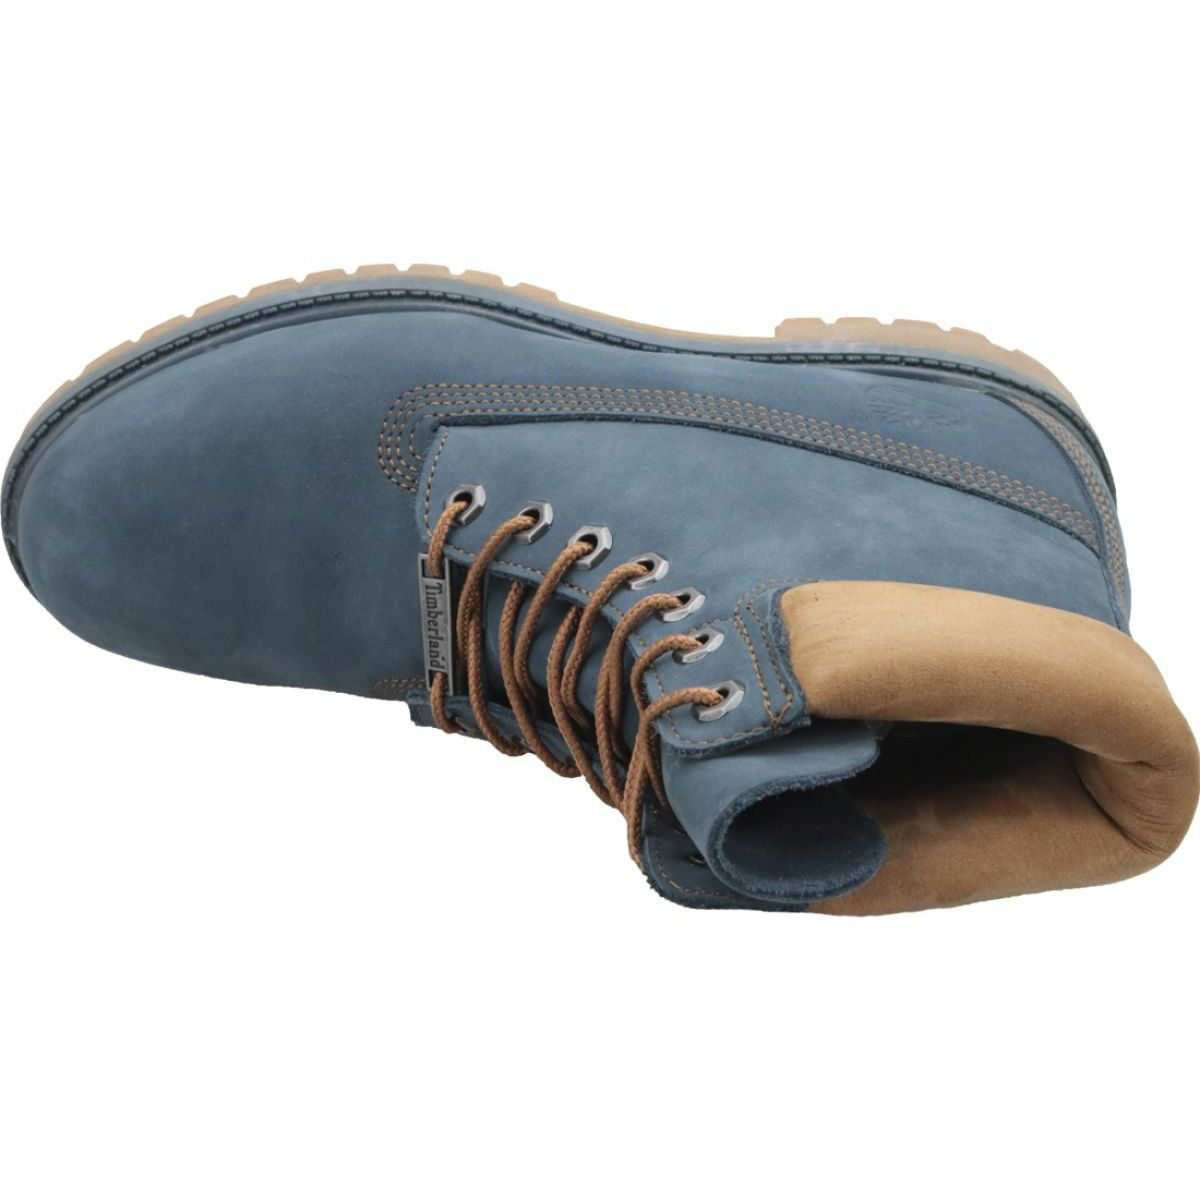 Buty Timberland 6 Inch Premium Boot M A1lu4 Granatowe Sport Shoes Men Boots Timberland